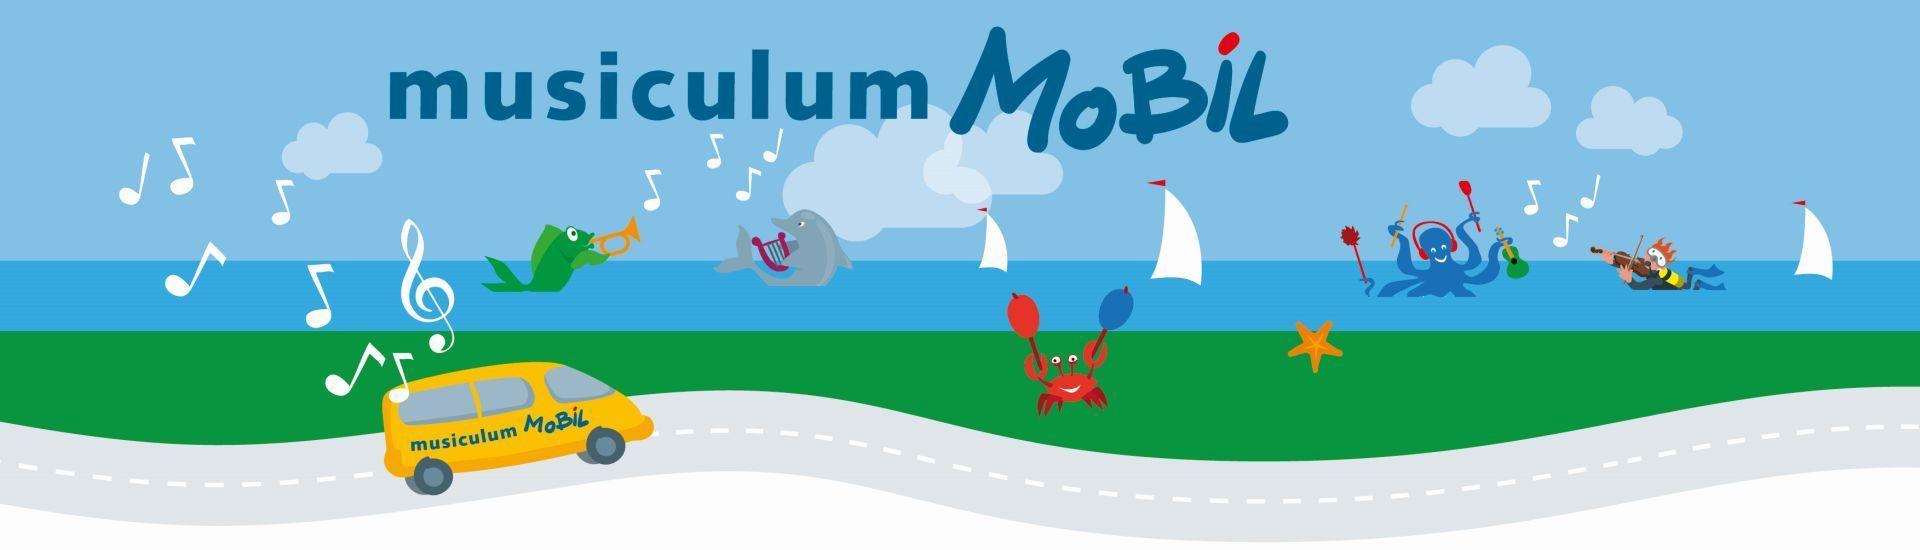 Musiculum Mobil auf großer Fahrt